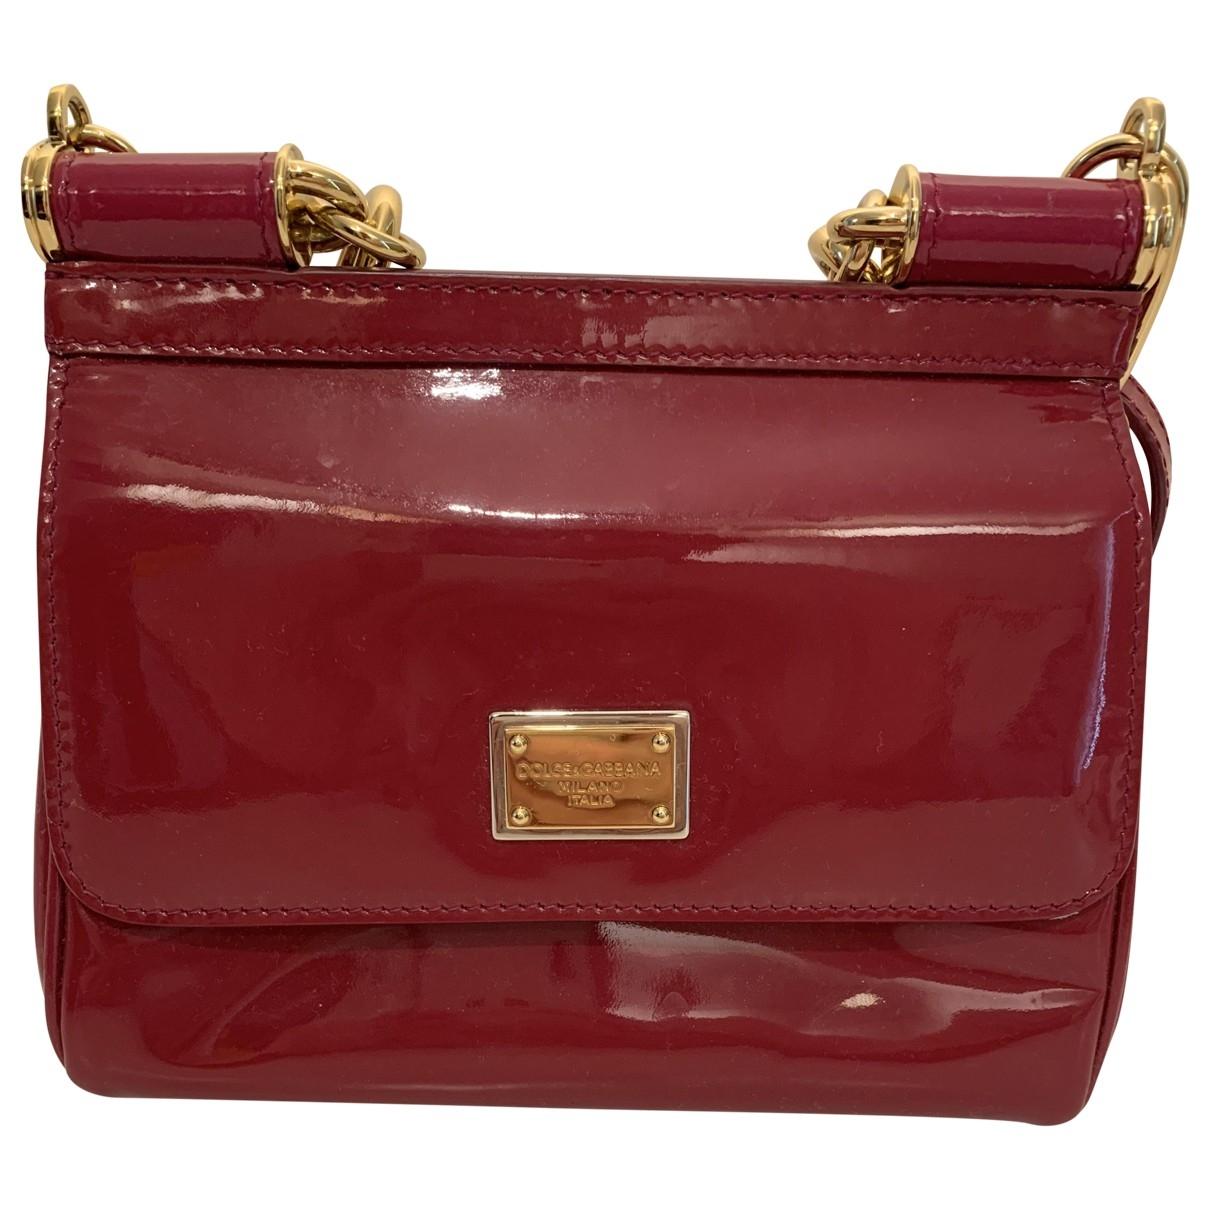 Dolce & Gabbana Sicily Handtasche in  Rosa Lackleder